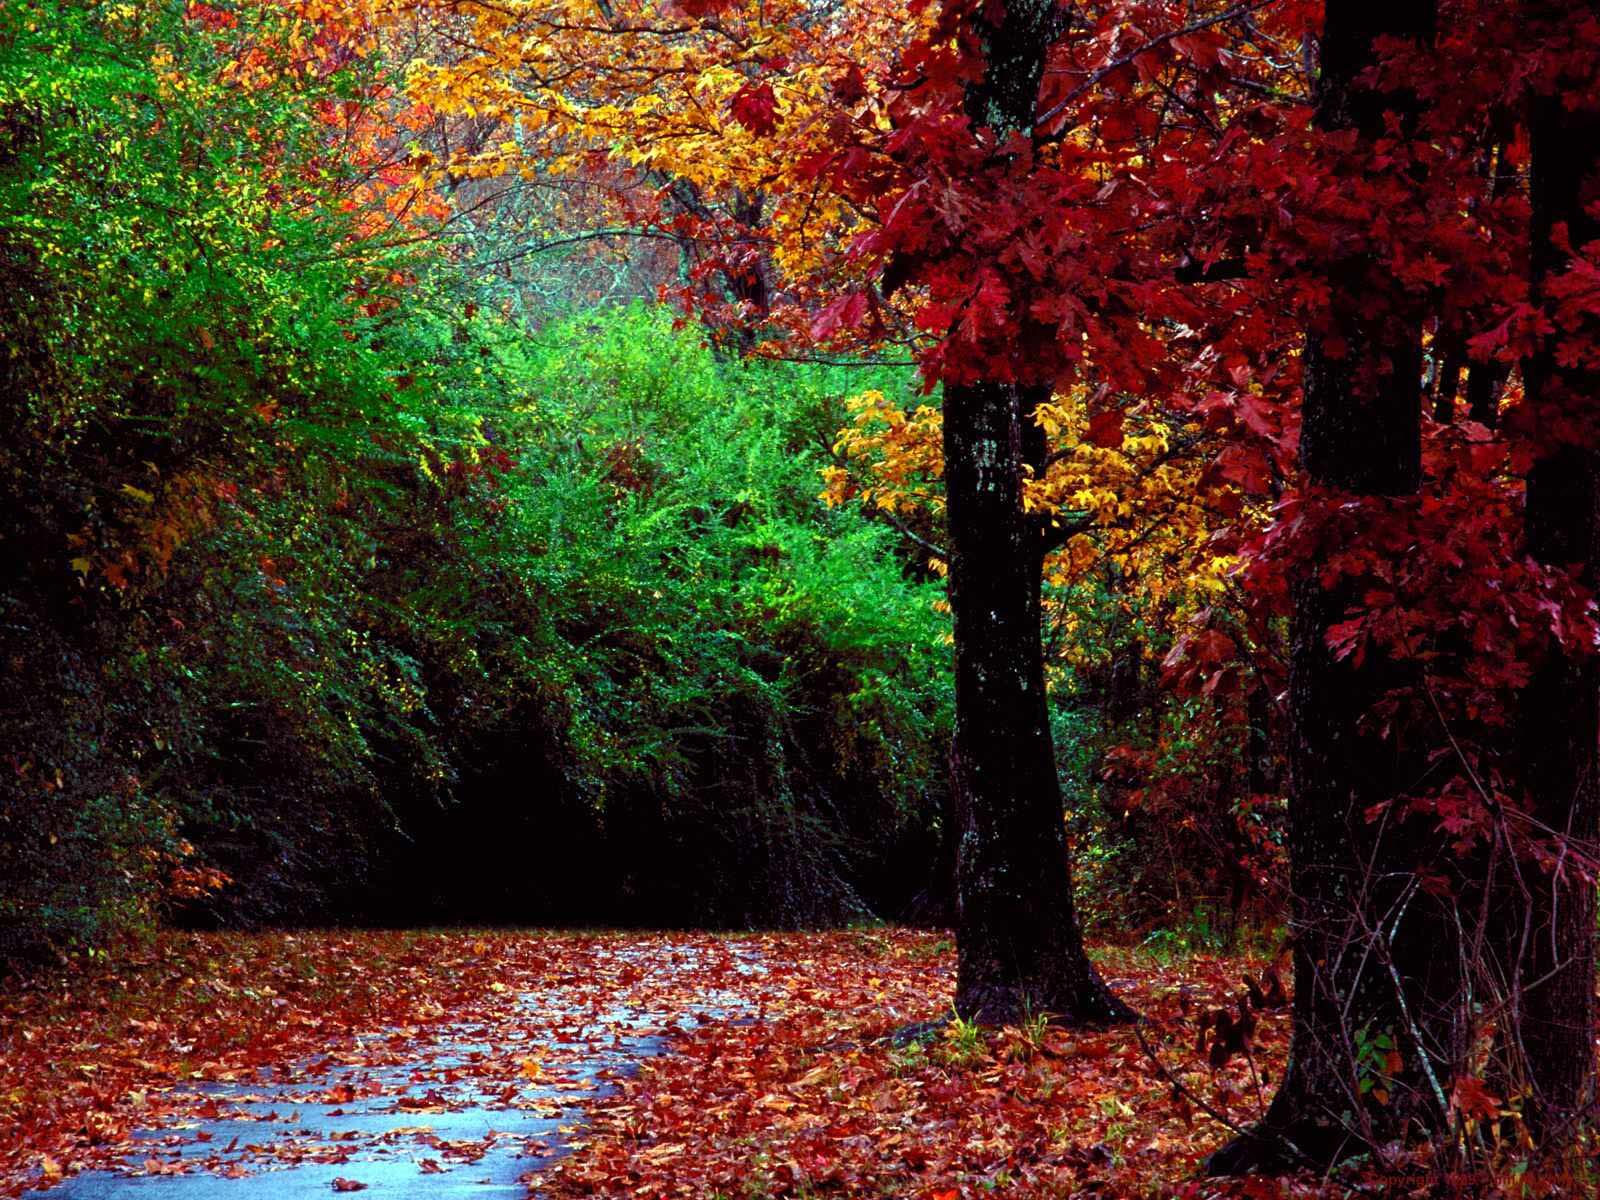 Autumn Forest and Landscape Color | 1600 x 1200 | Download | Close